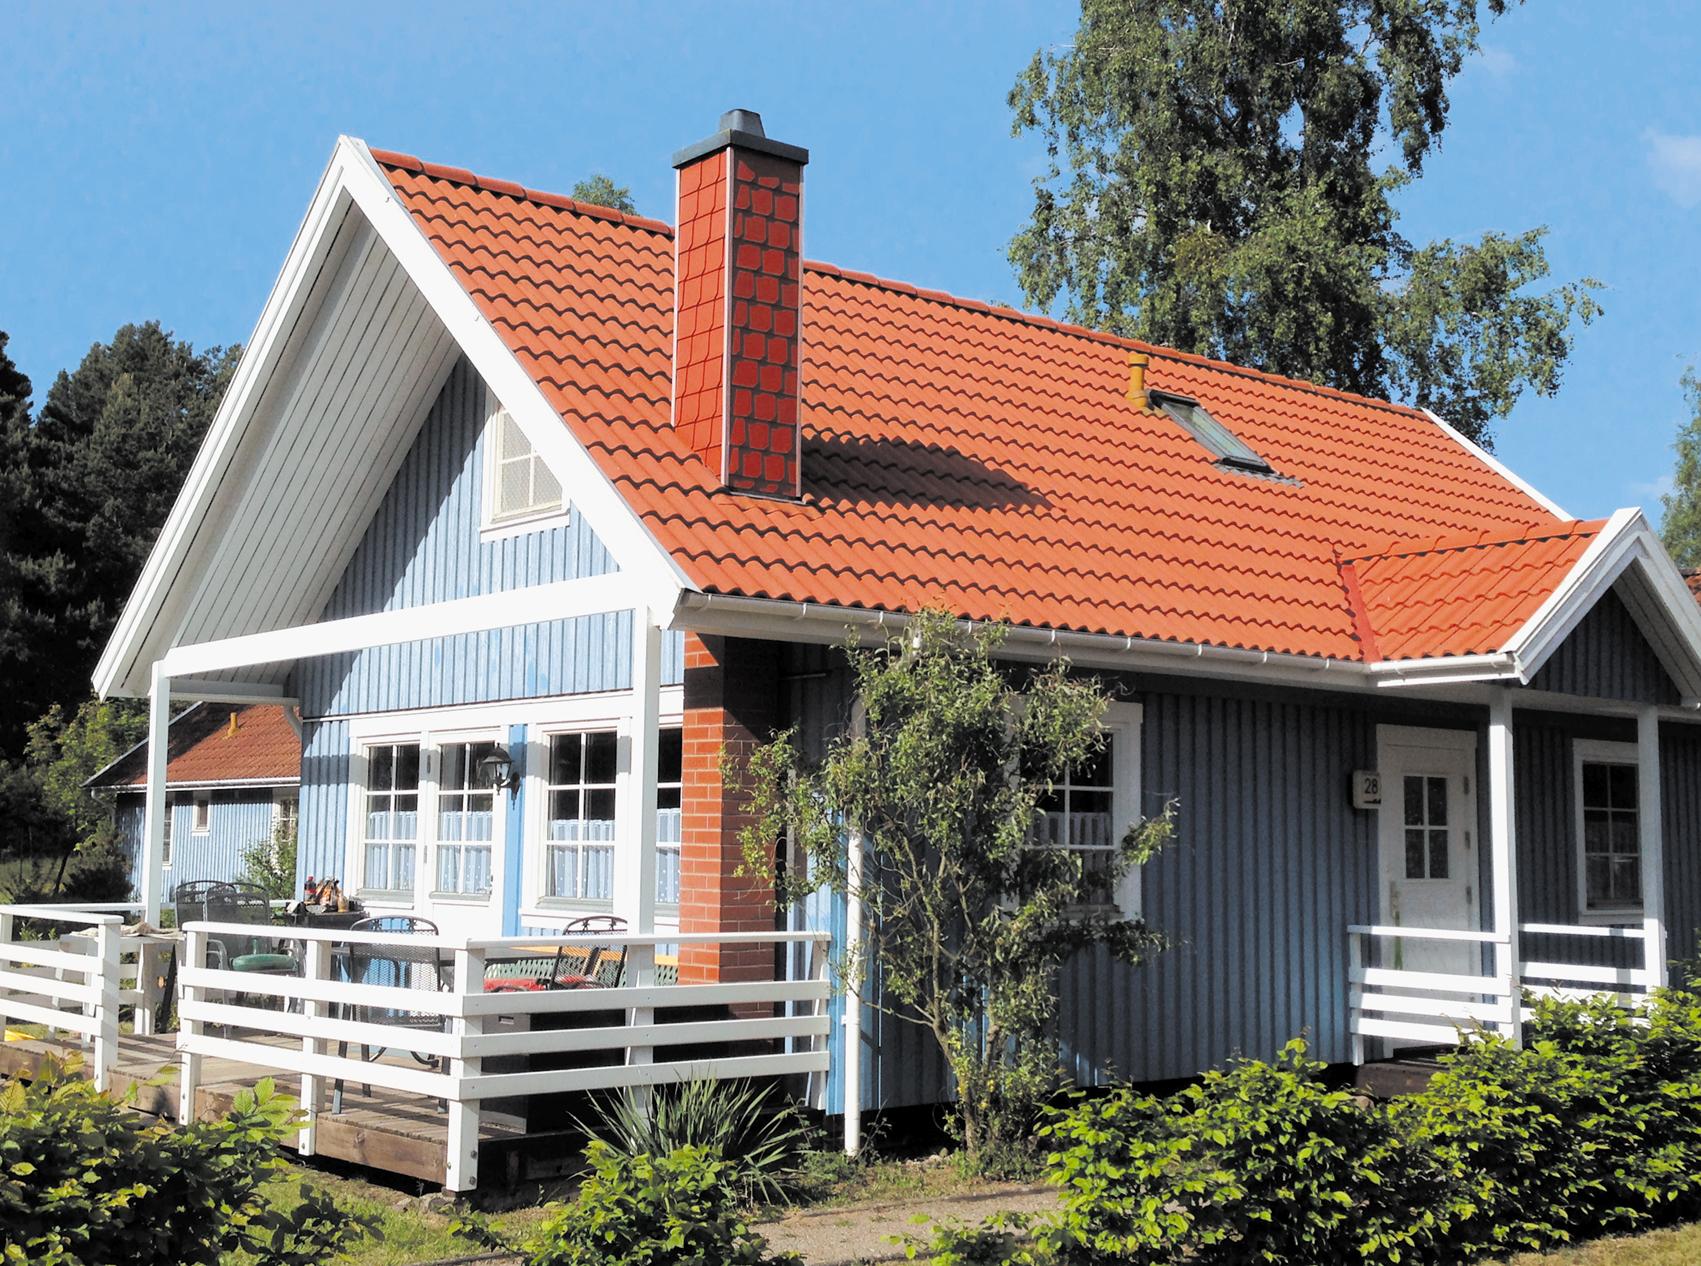 ferienh user useriner see userin ferienhaus schwedenhaus. Black Bedroom Furniture Sets. Home Design Ideas